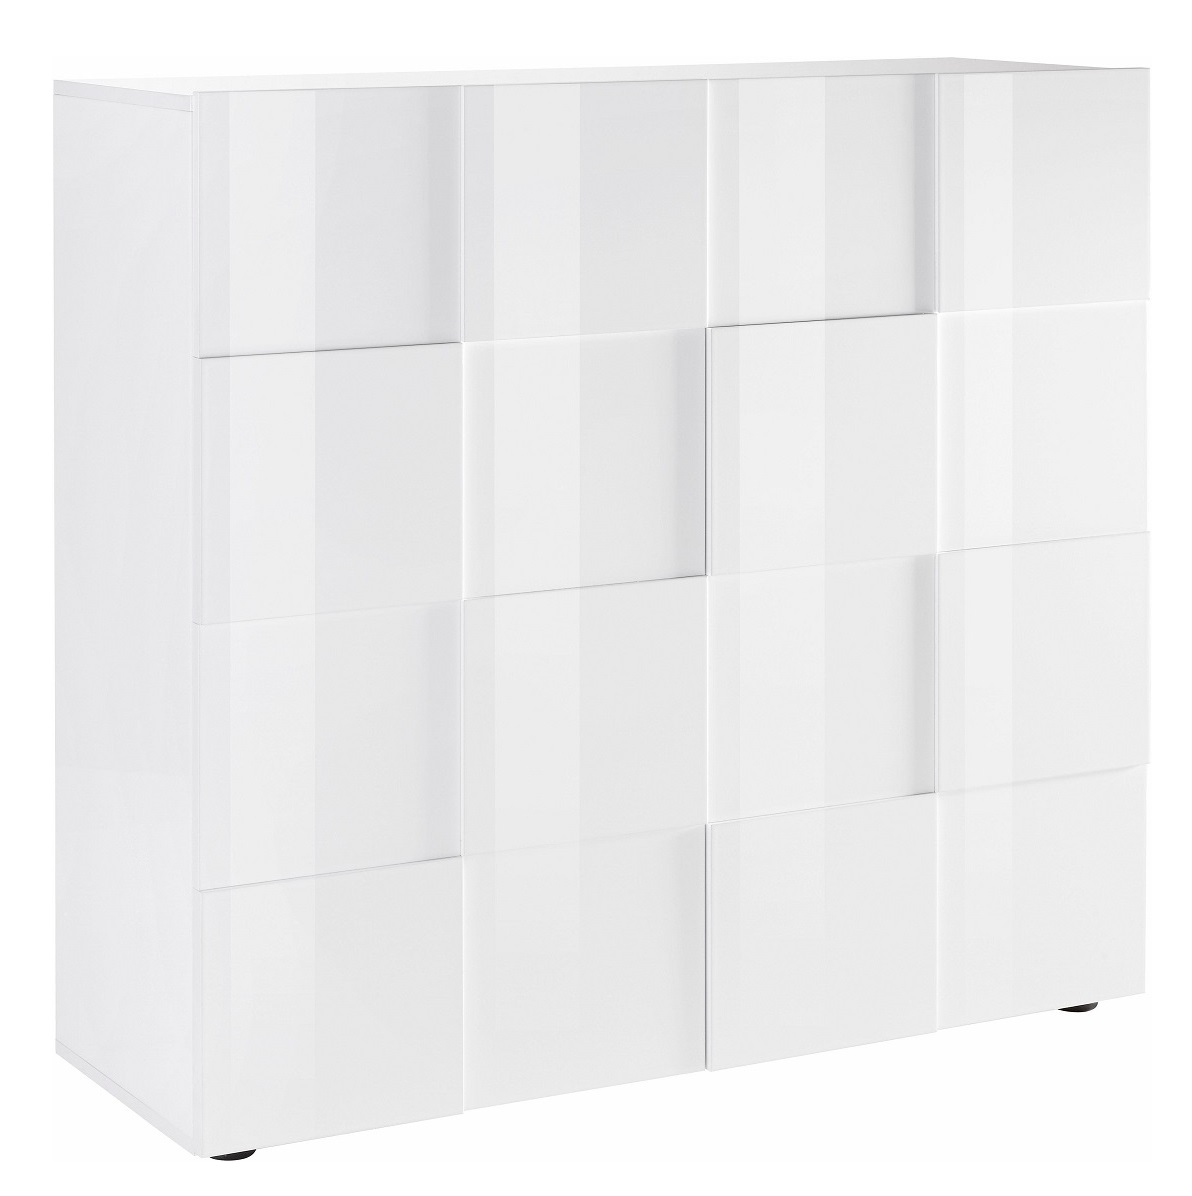 Opbergkast Dama 111 cm hoog Hoogglans wit